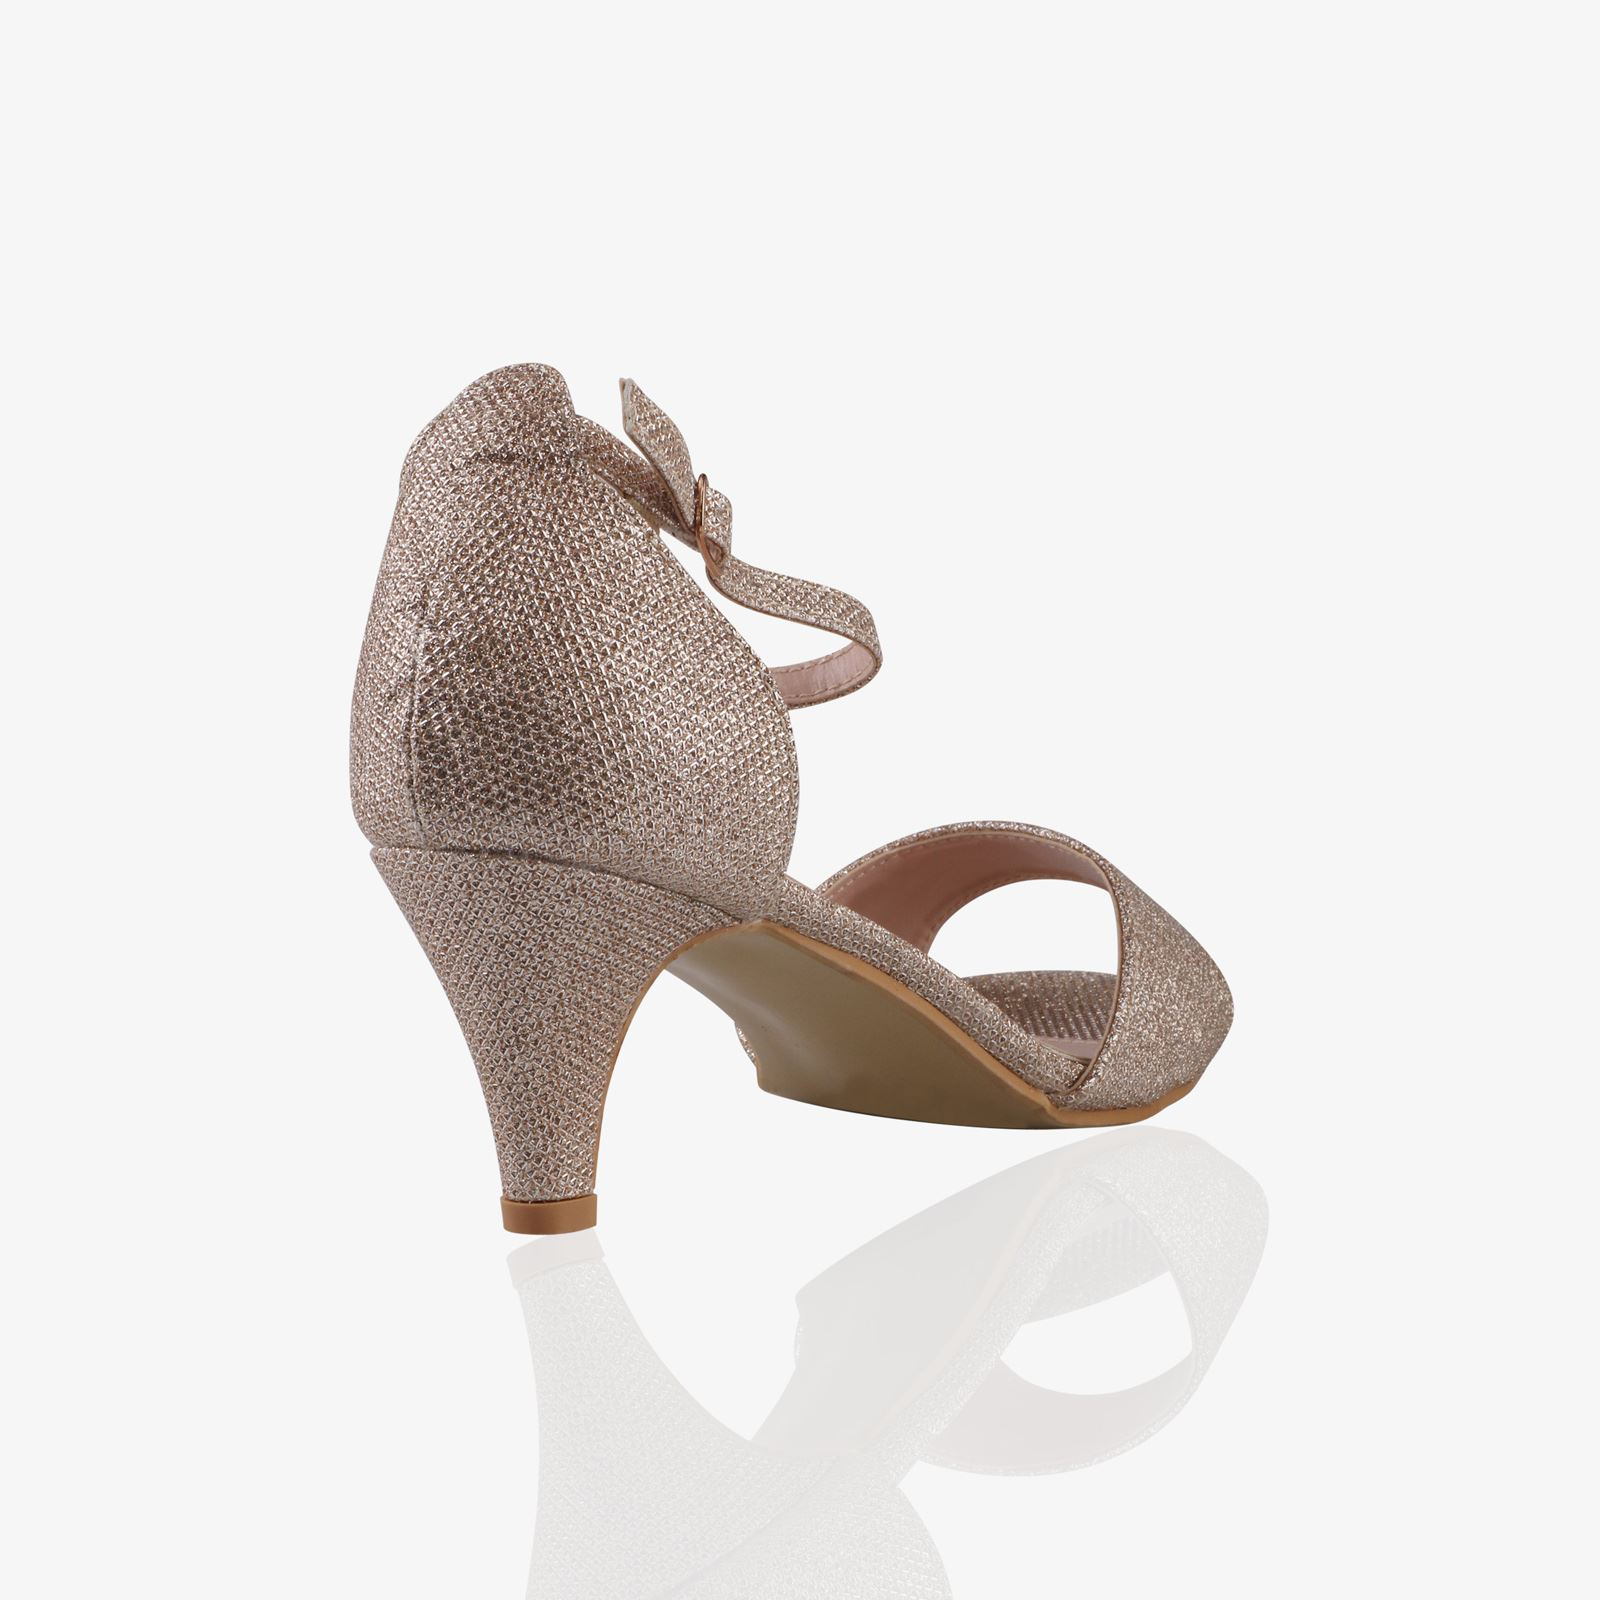 Women-Ladies-Low-Kitten-Heel-Court-Shoes-Open-Toe-Glitter-Sandals-Party-Bridal thumbnail 4